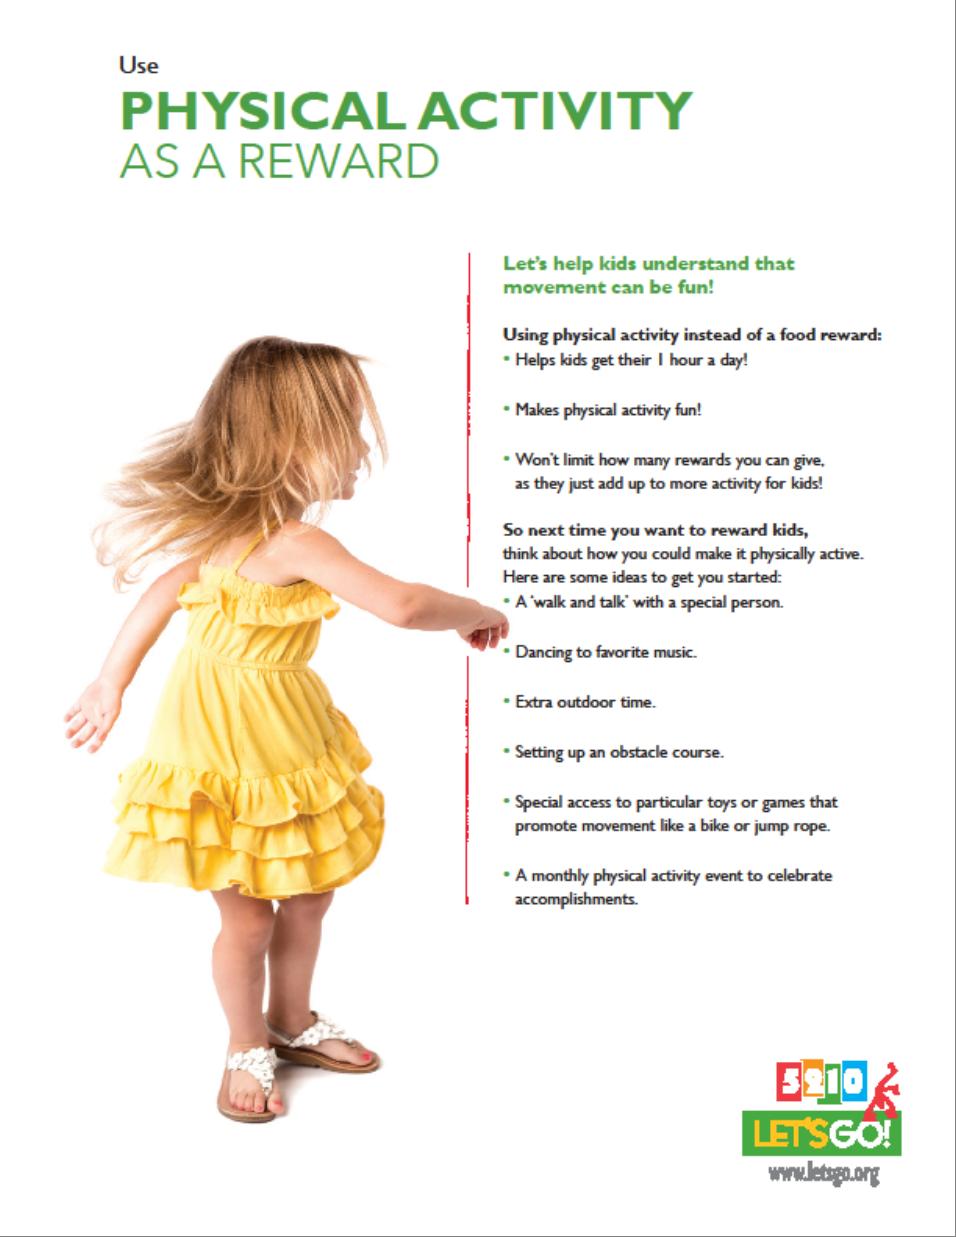 Physical Activity as a Reward.png